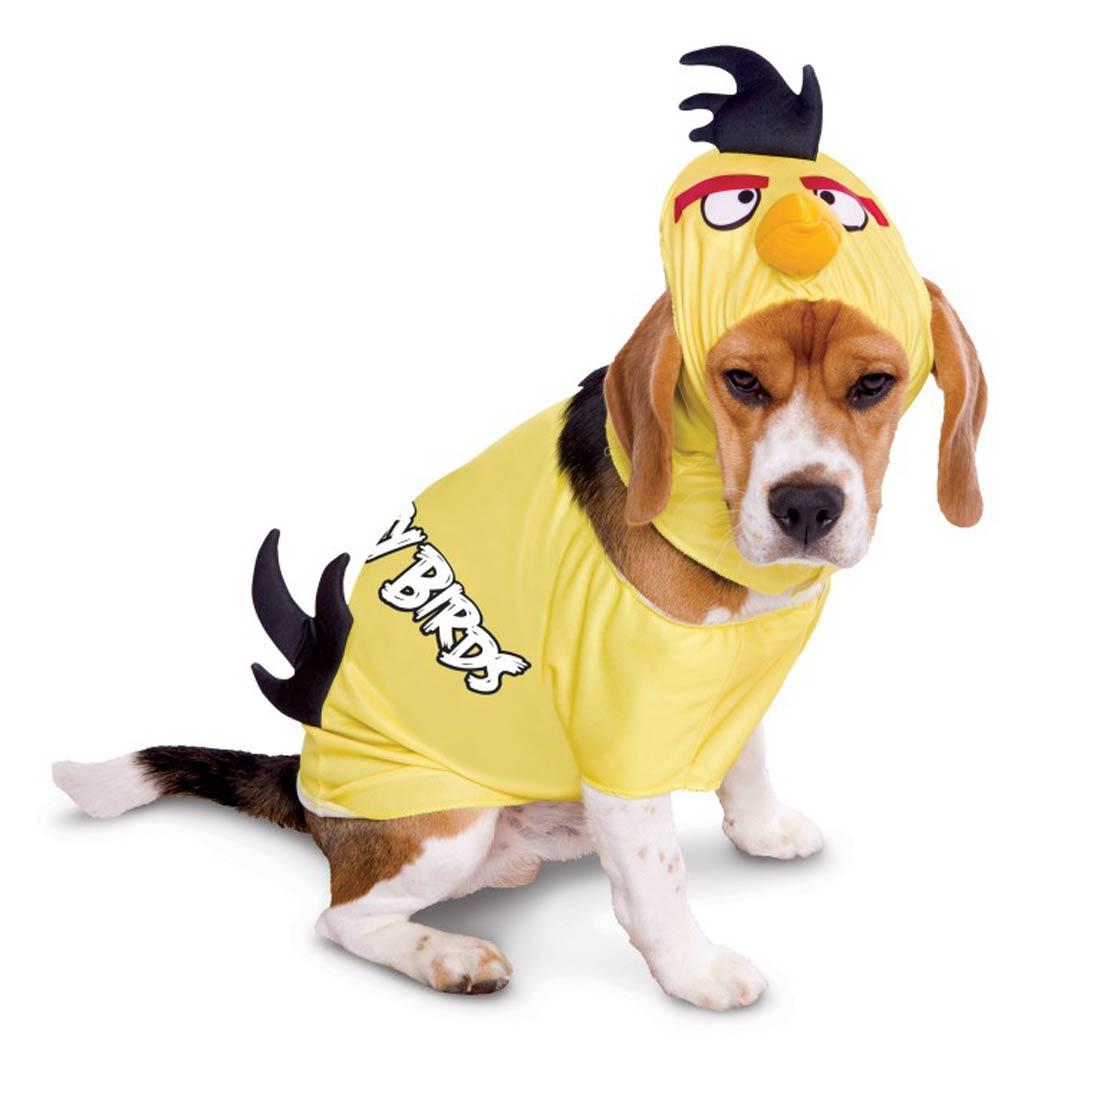 6748347-Angry-Birds-Yellow-Bird-Dog-Costume-large